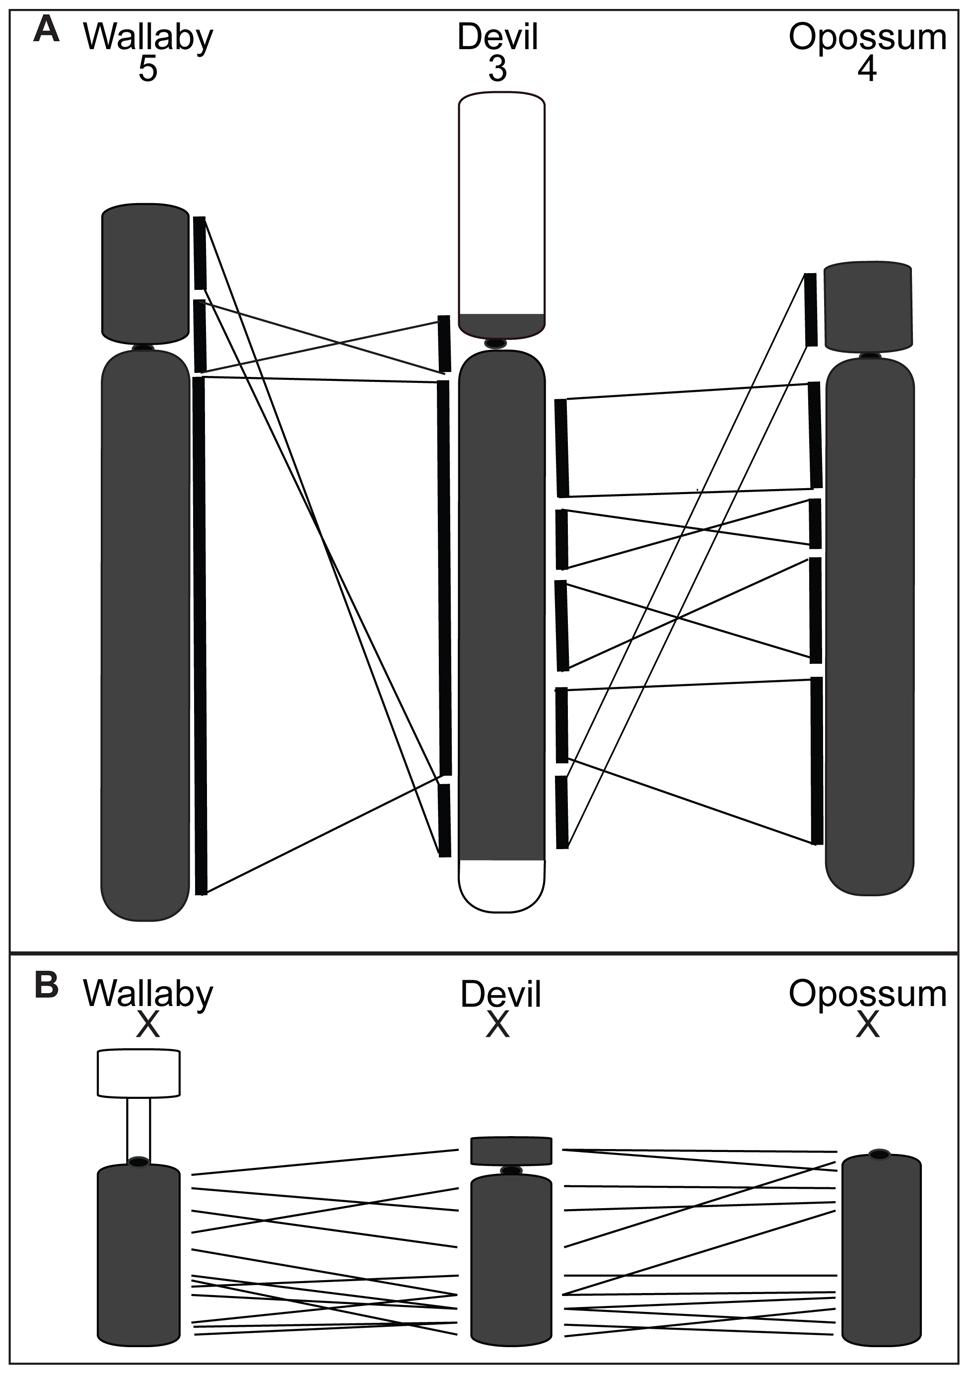 Comparison of gene arrangement among devil, wallaby, and opossum chromosomes.